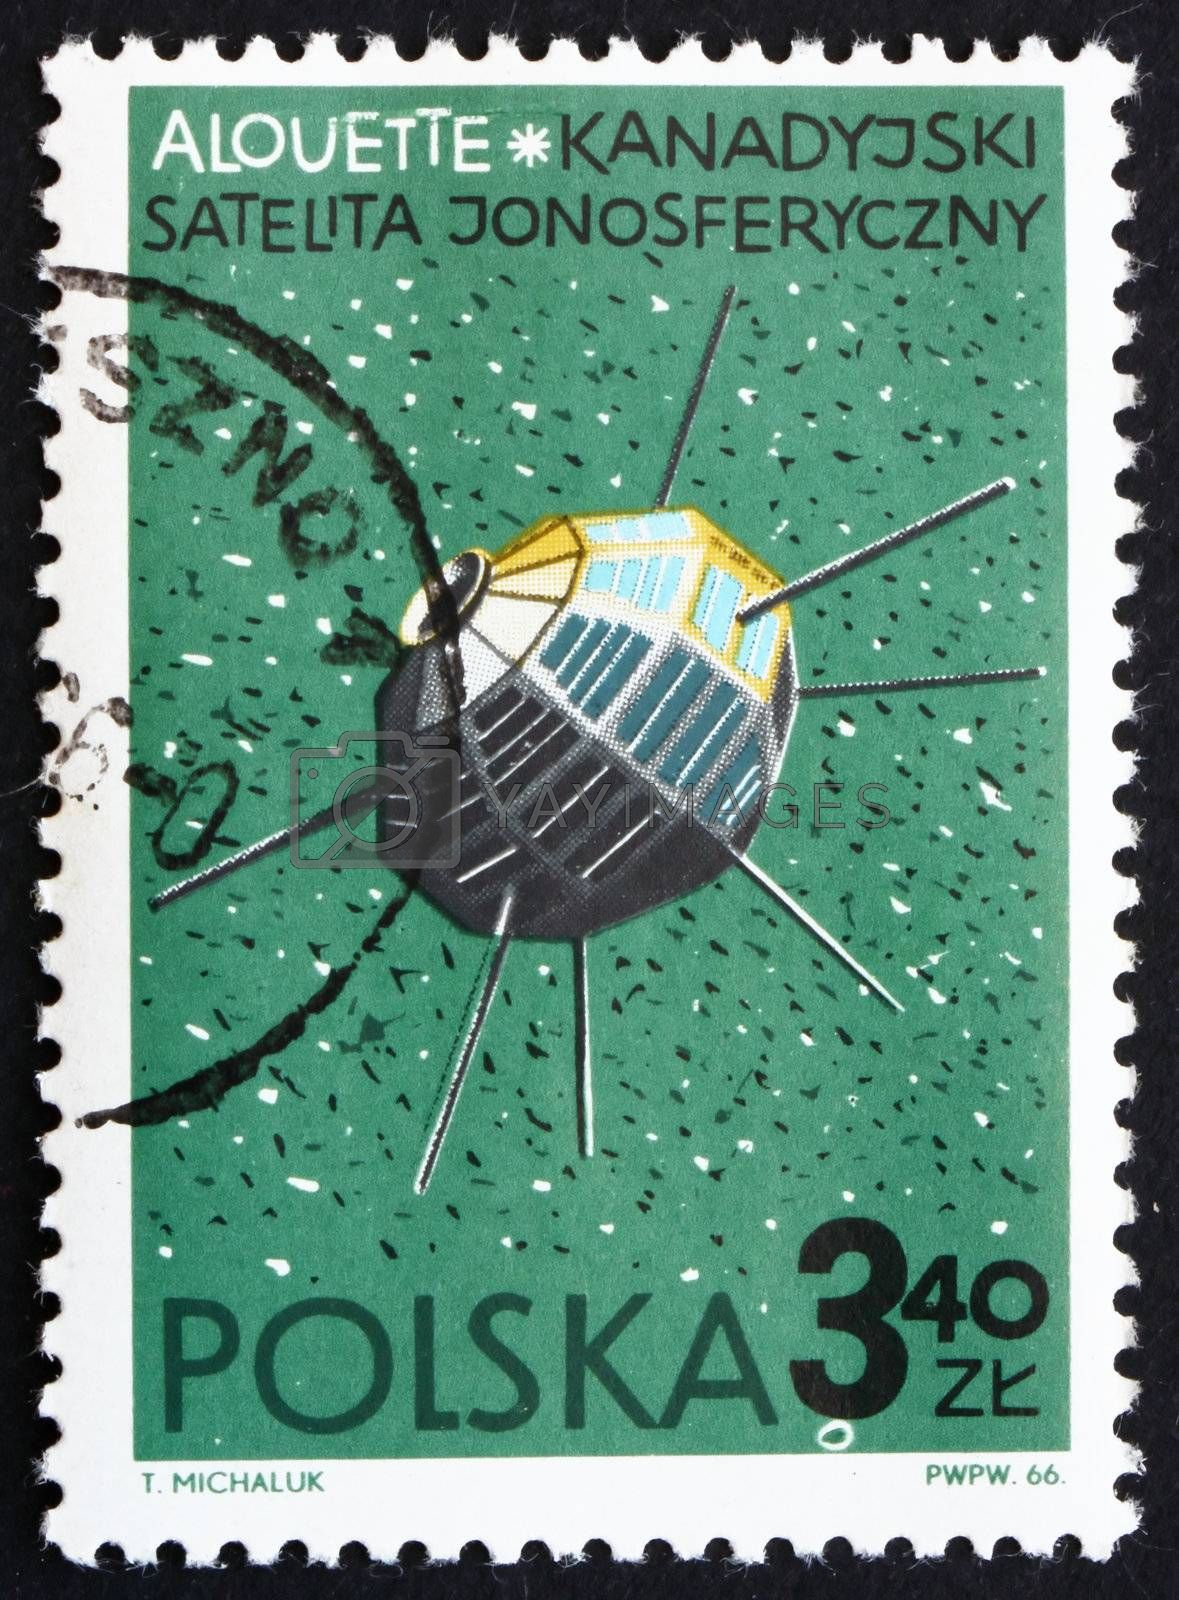 POLAND - CIRCA 1966: a stamp printed in the Poland shows Alouette, Canadian Satellite, circa 1966